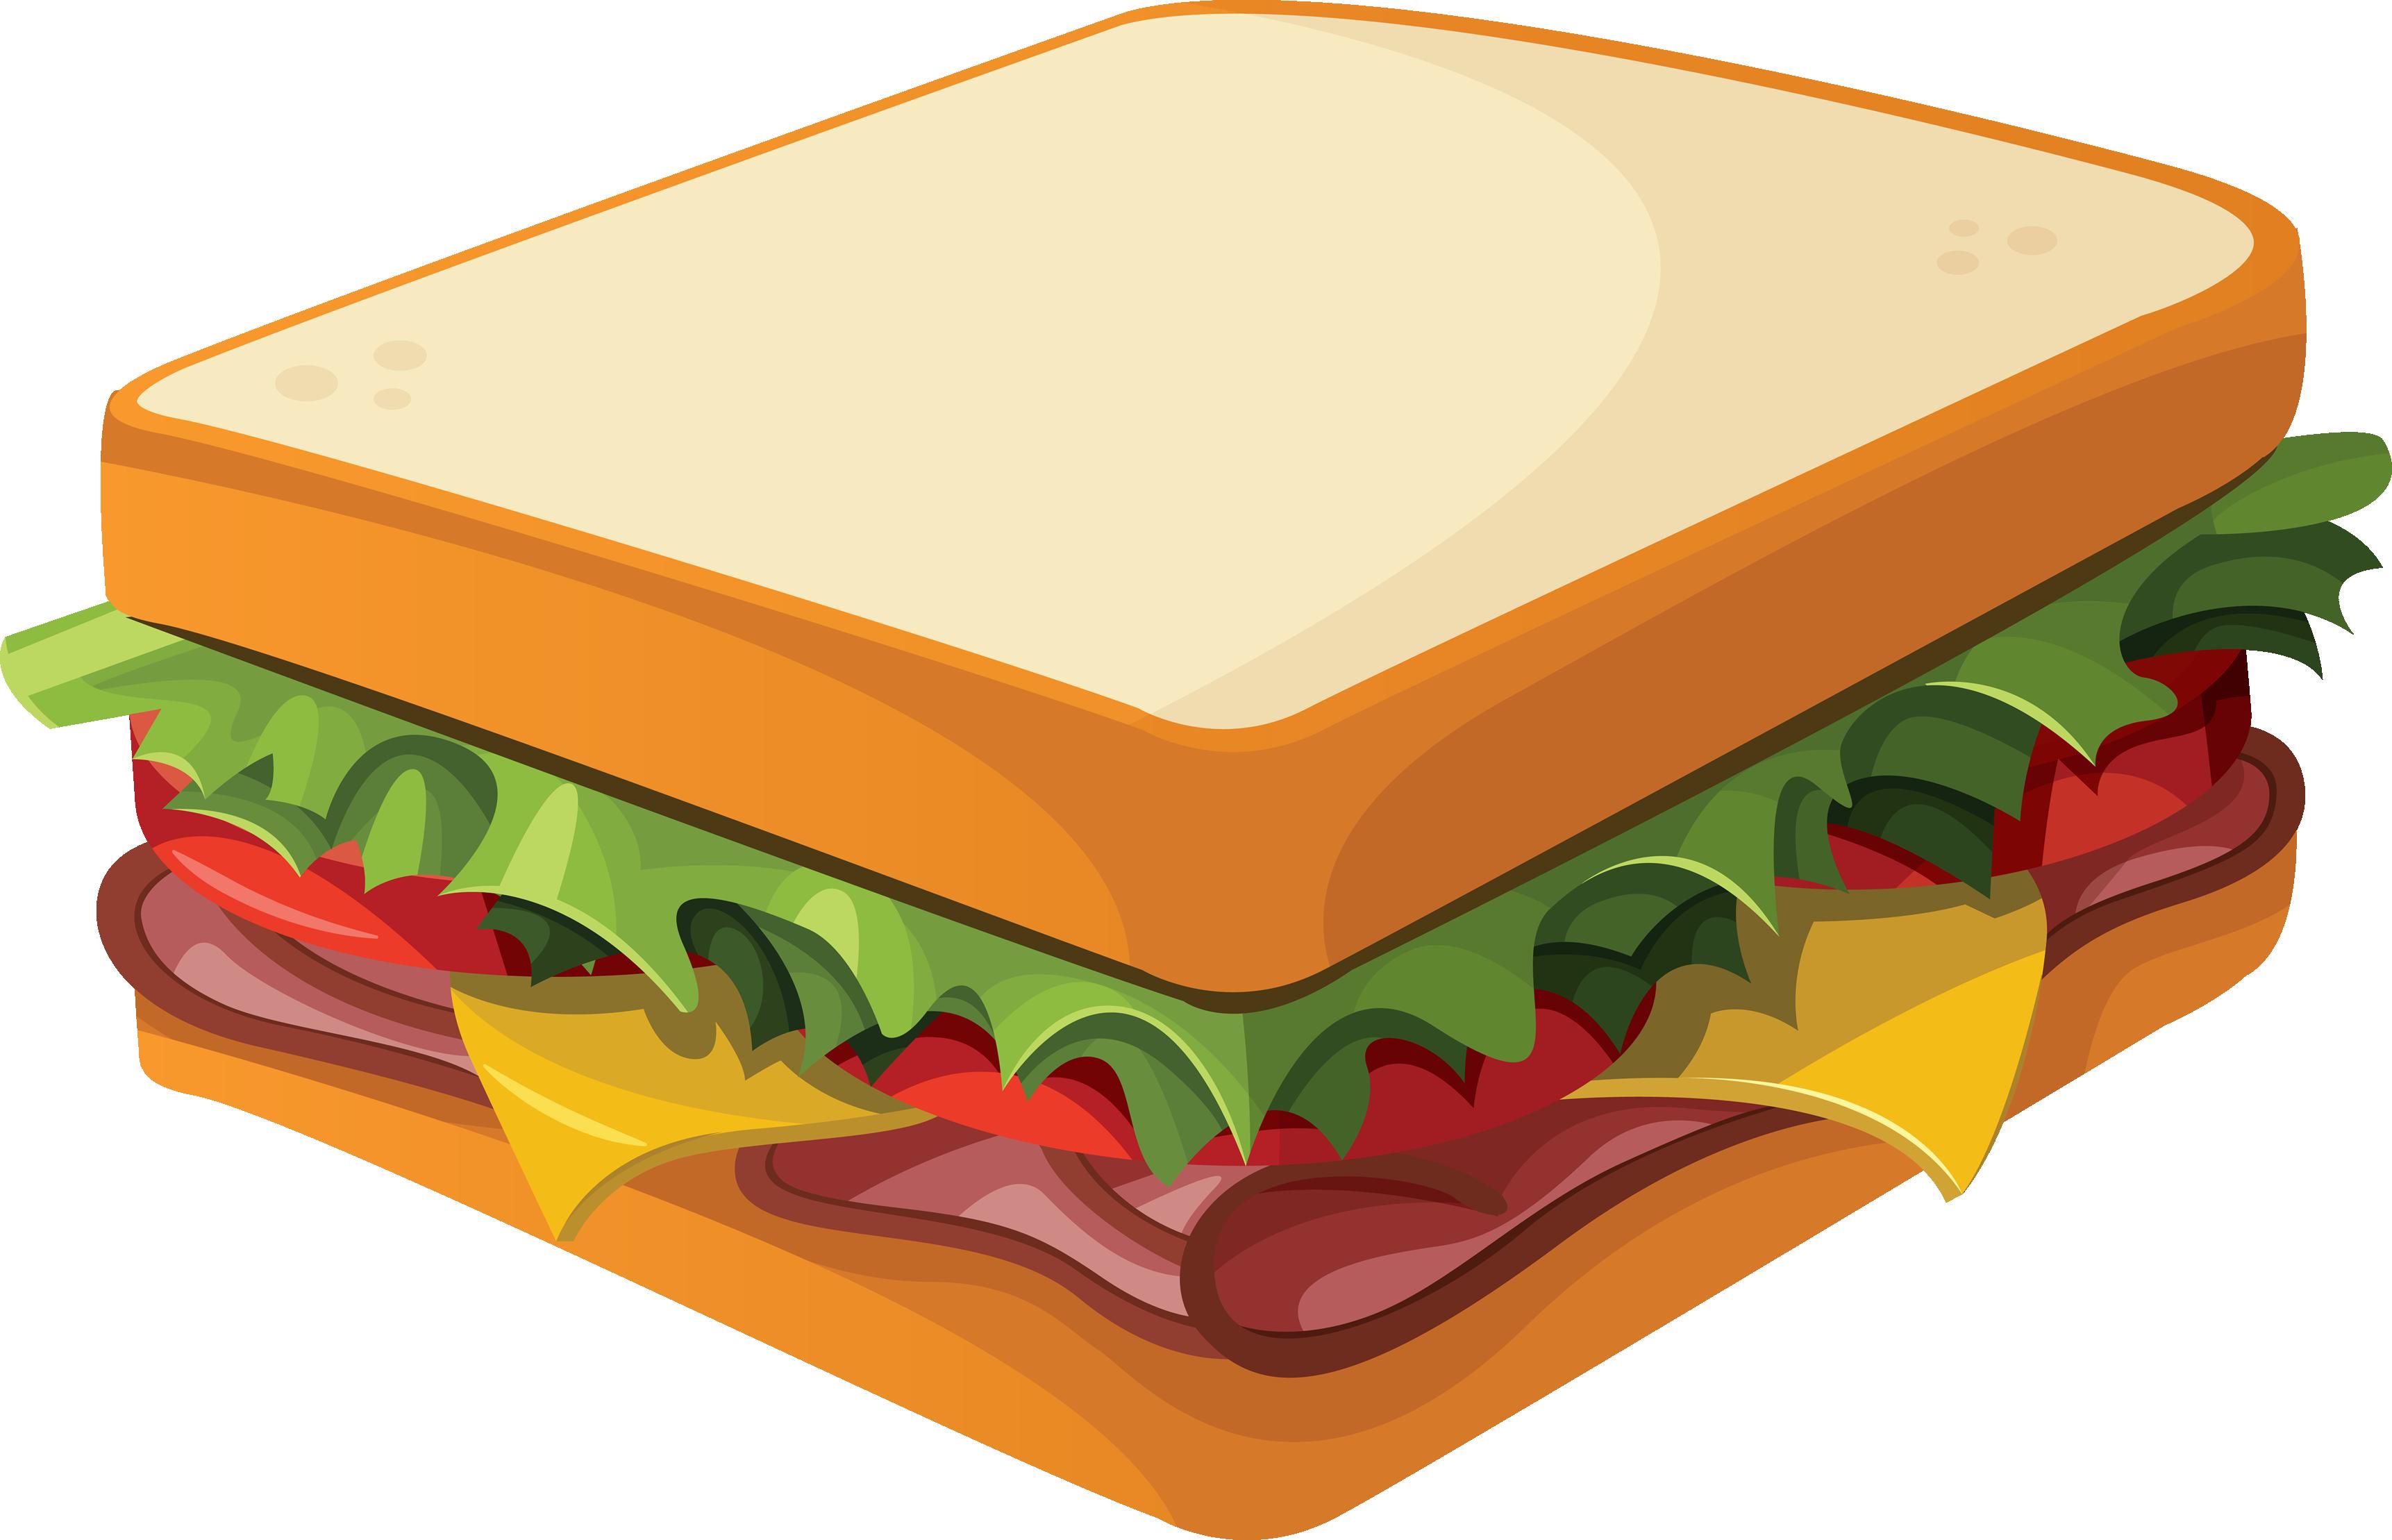 sandwich clip art free clipart panda free clipart images rh clipartpanda com sandwich images clipart sandwich clipart free